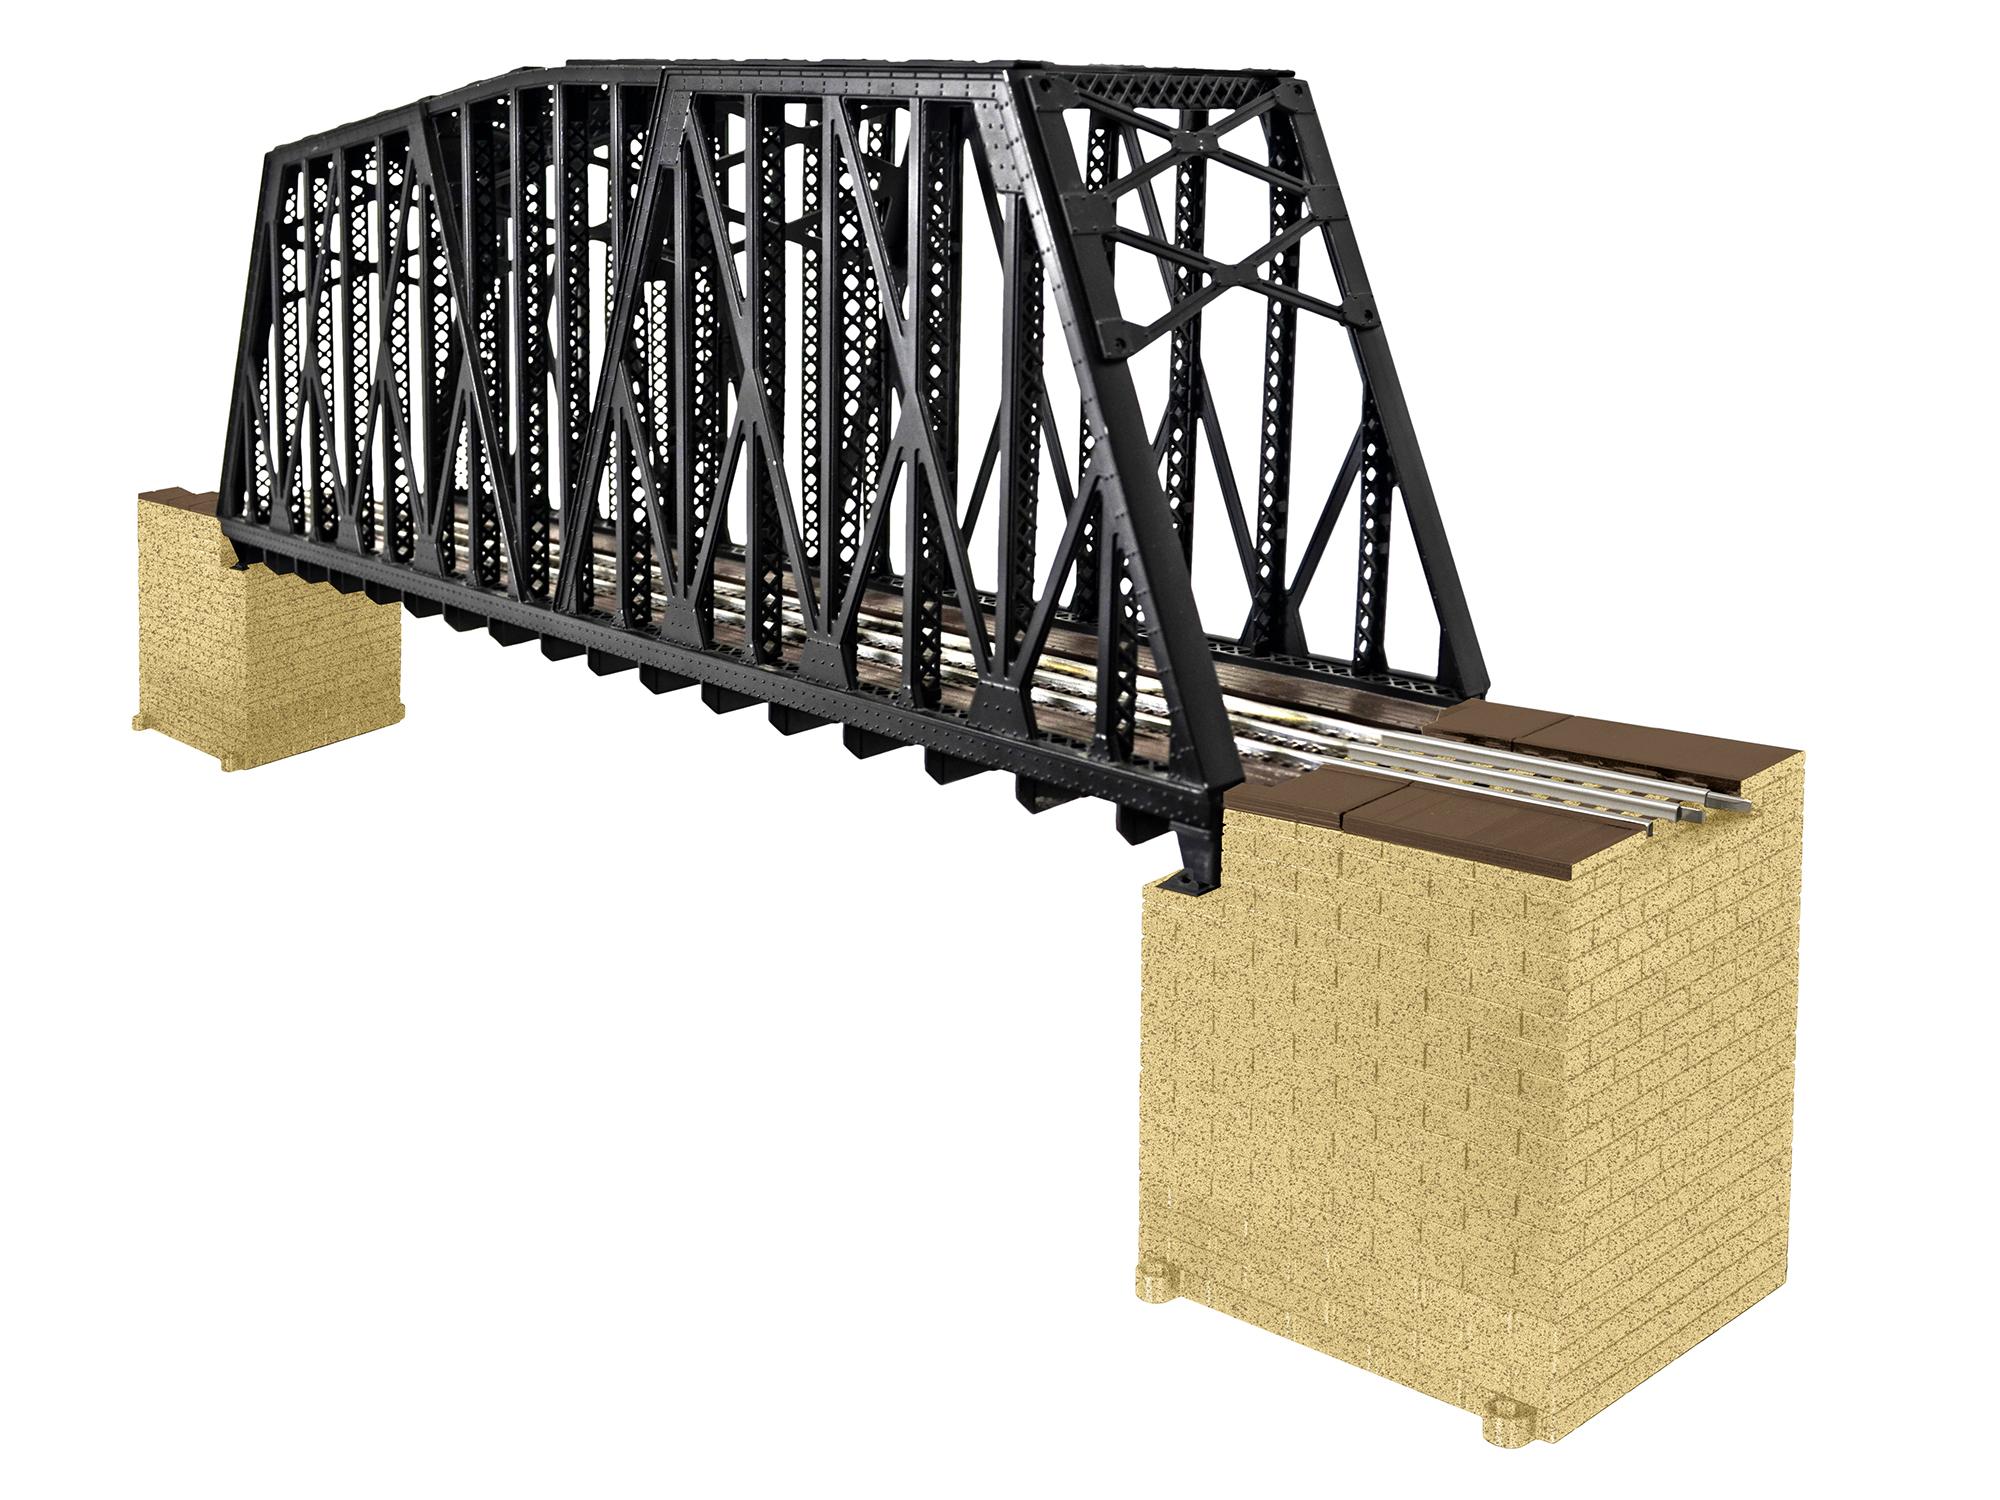 LNL682110 Lionel O Extended Truss Bridge 434-682110